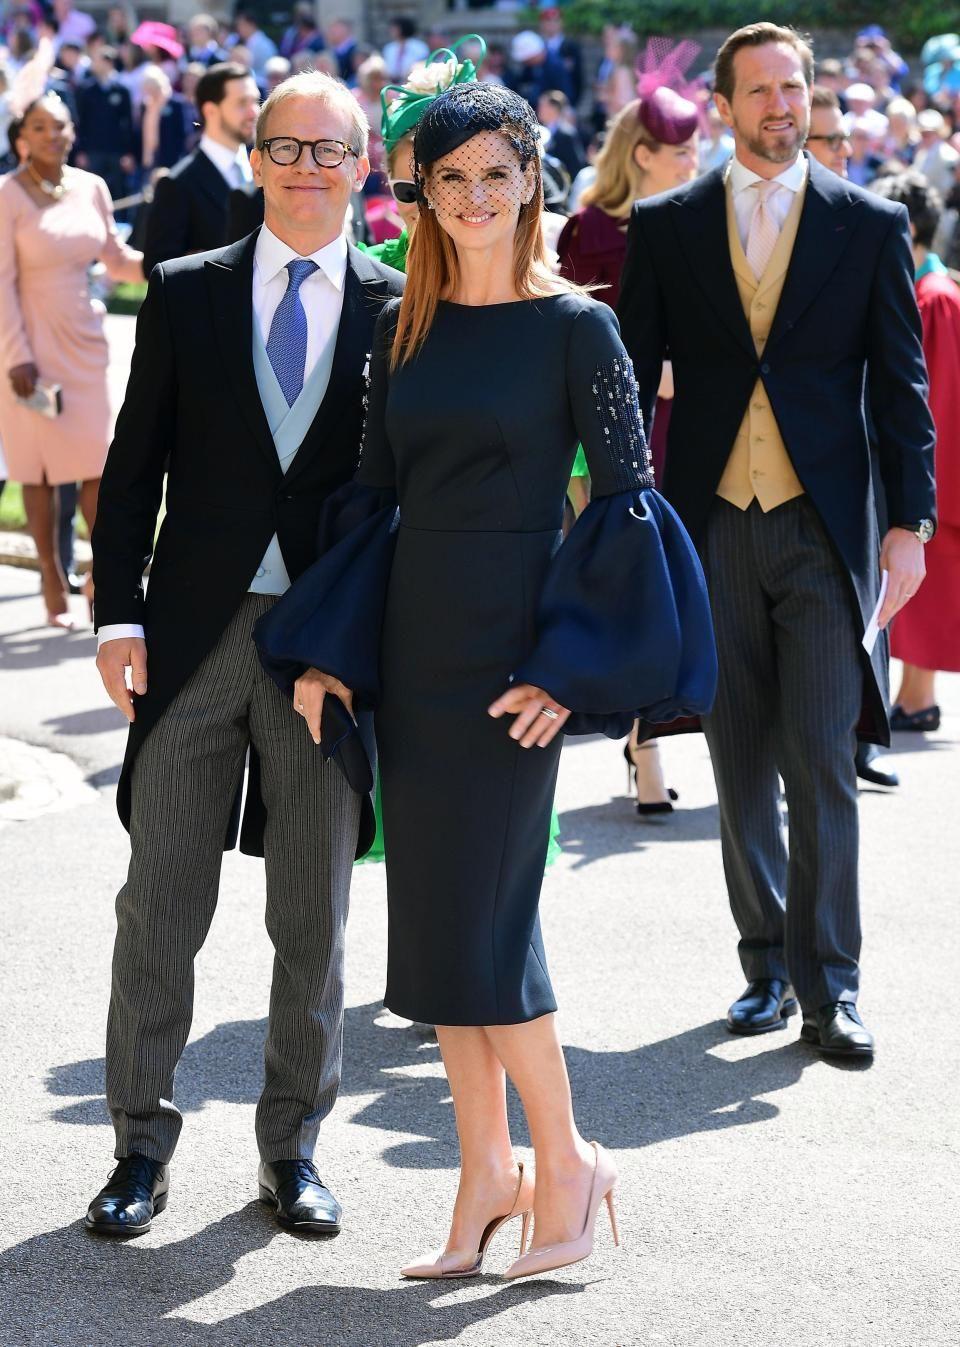 Oprah wedding dresses  Amal Clooney Victoria Beckham and Oprah Winfrey lead the stars